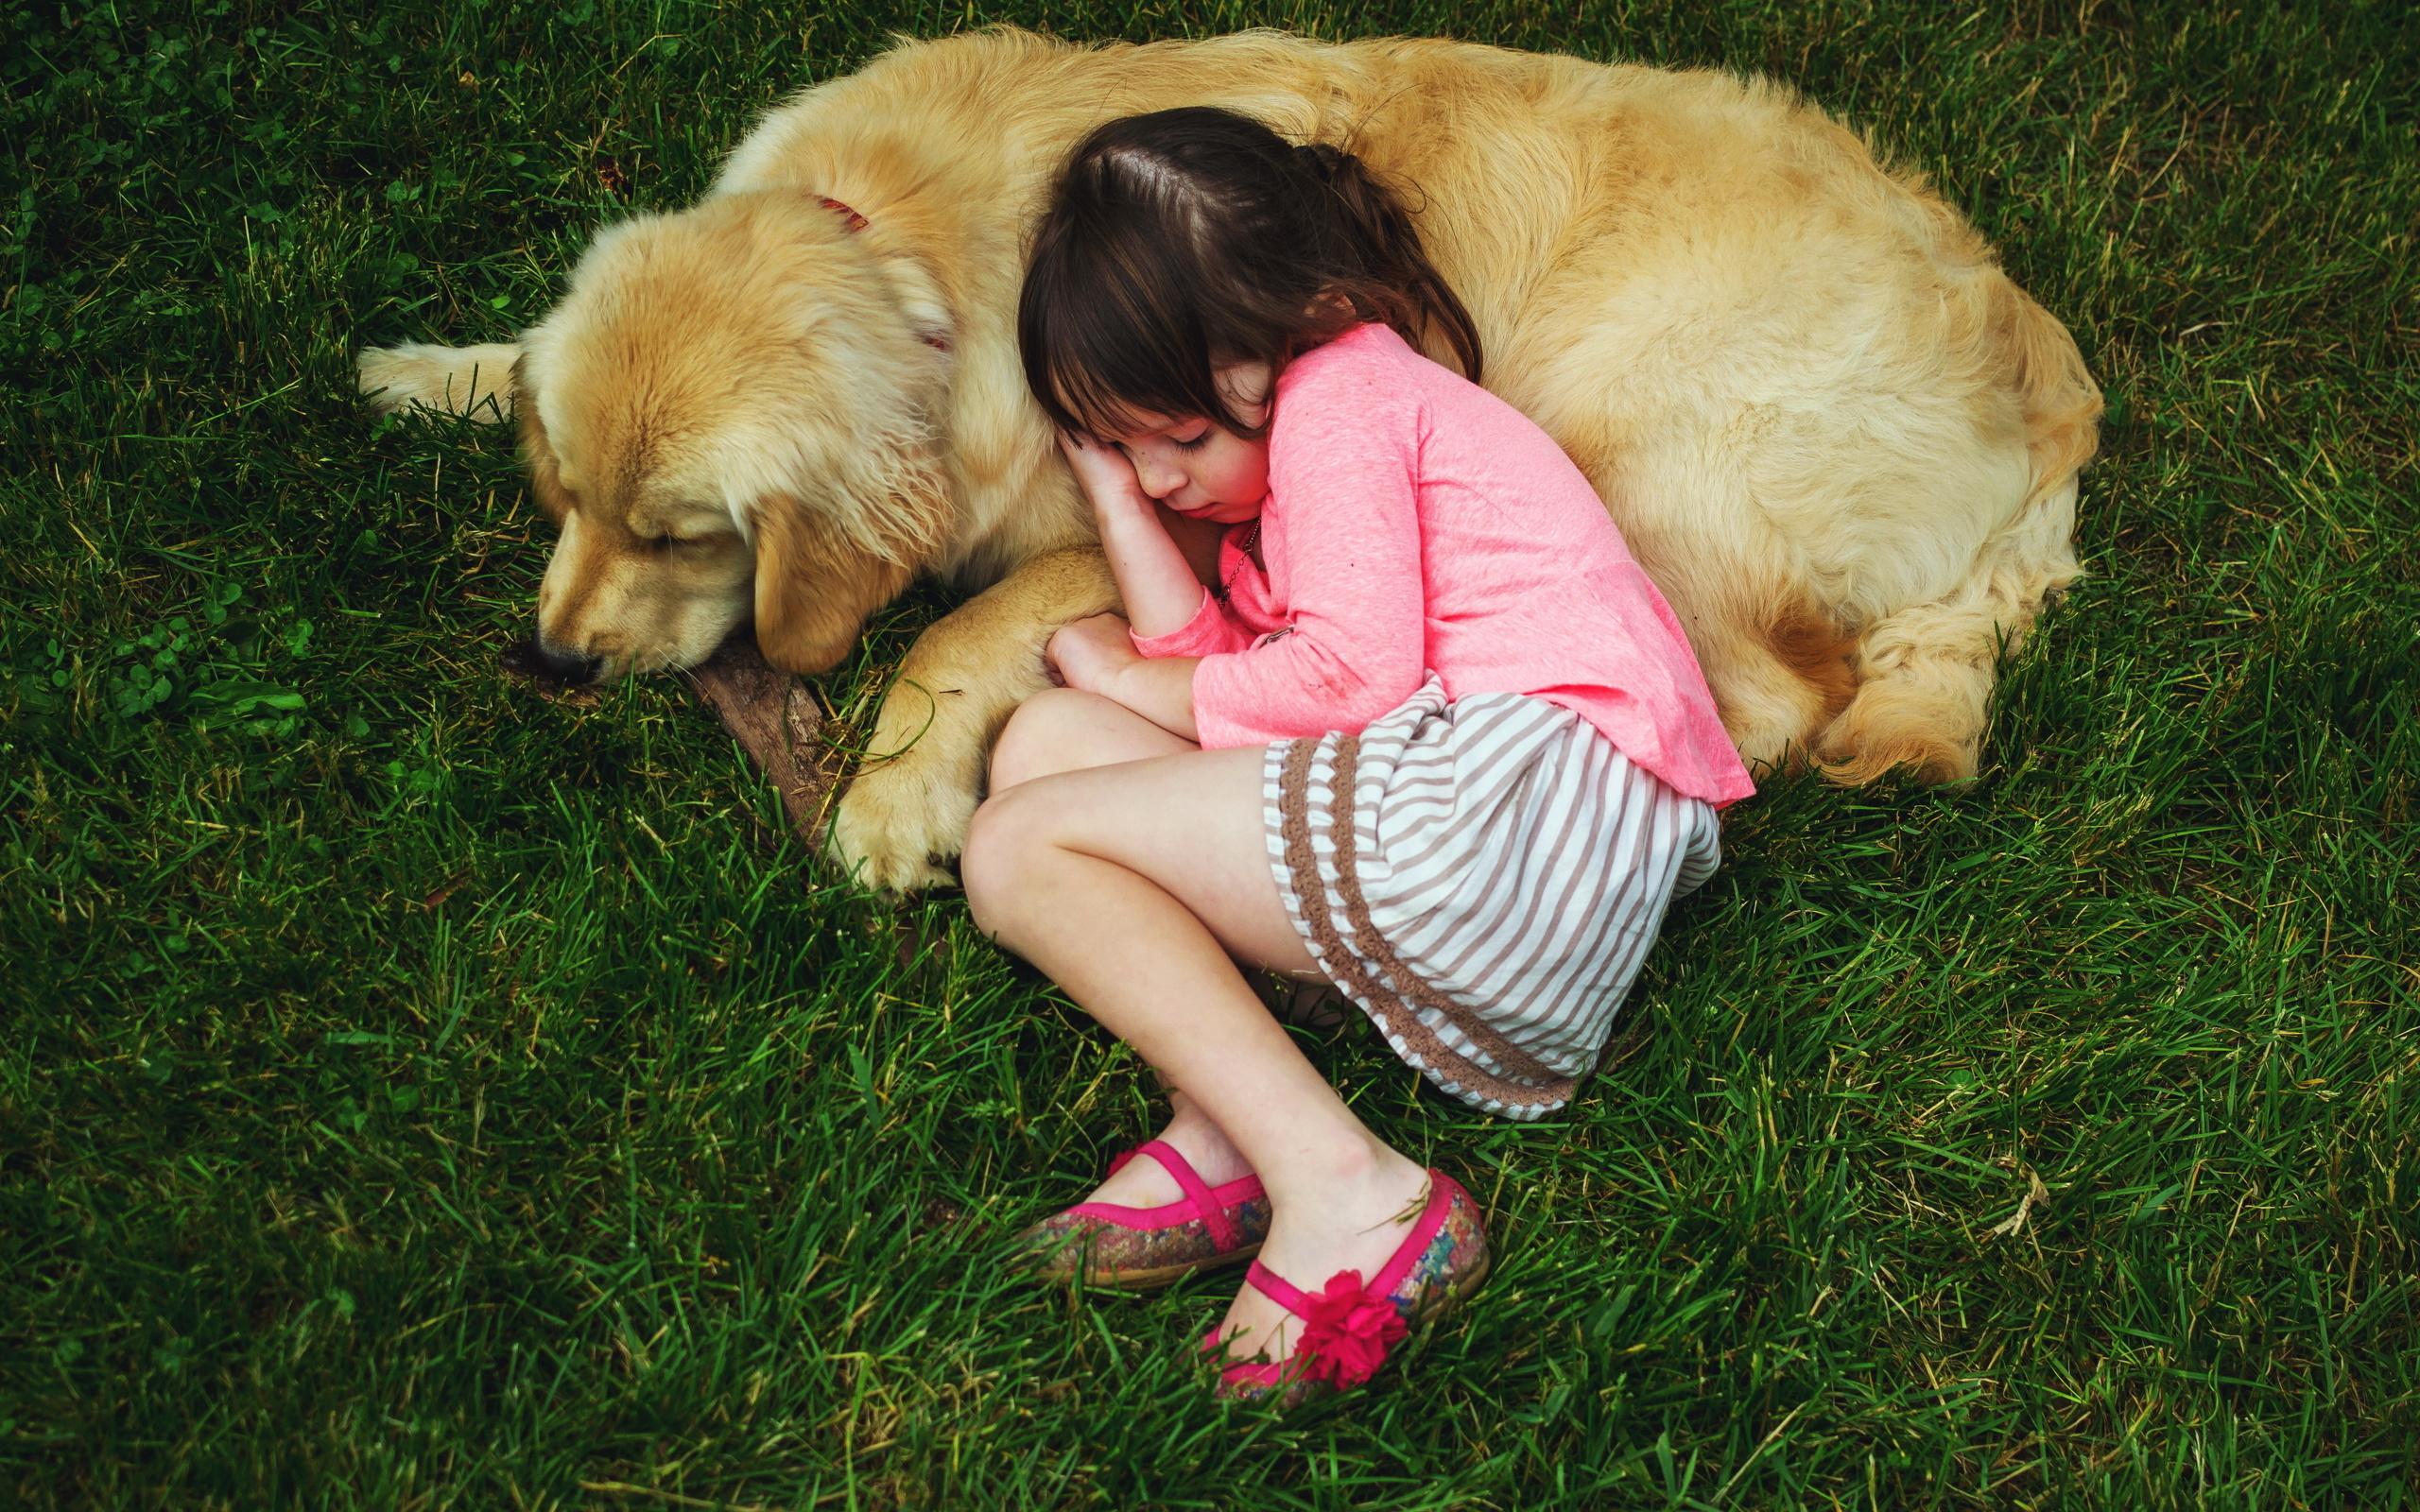 девочка, ребенок, собака, фото. сон, позитив, друзья